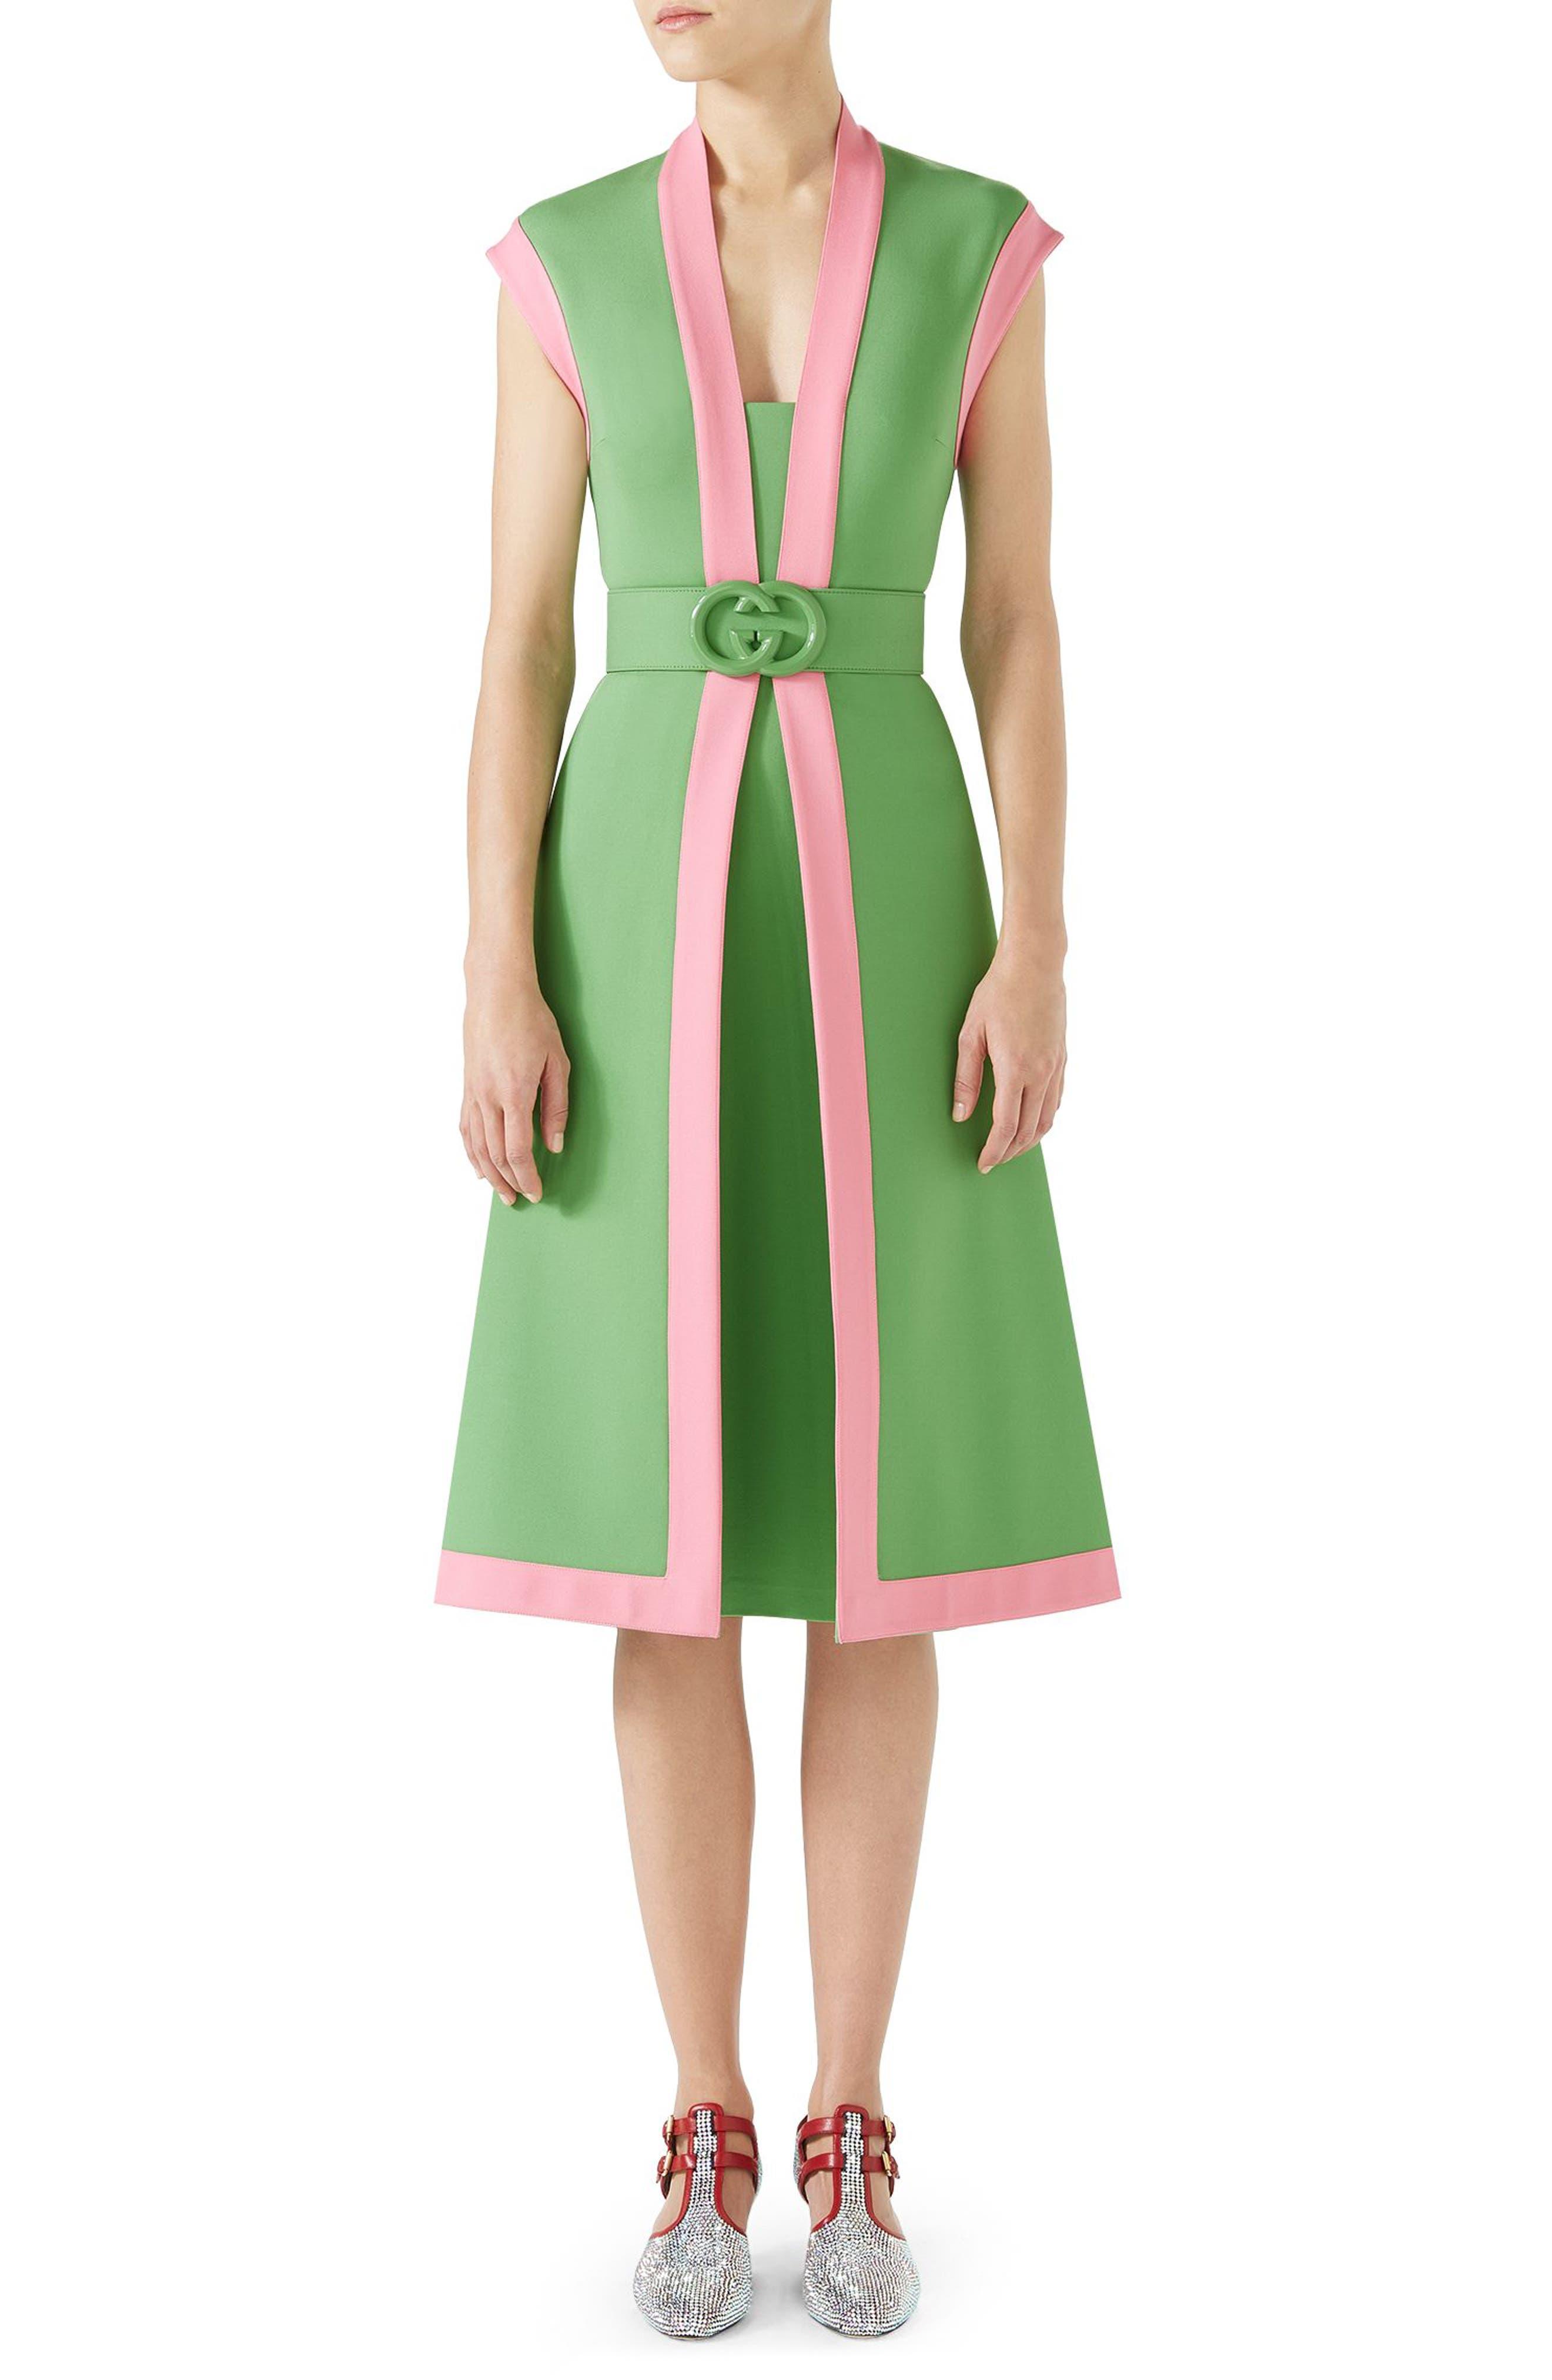 Contrast Trim Belted Dress,                             Alternate thumbnail 4, color,                             ALMOND FLOWER/ ROYAL